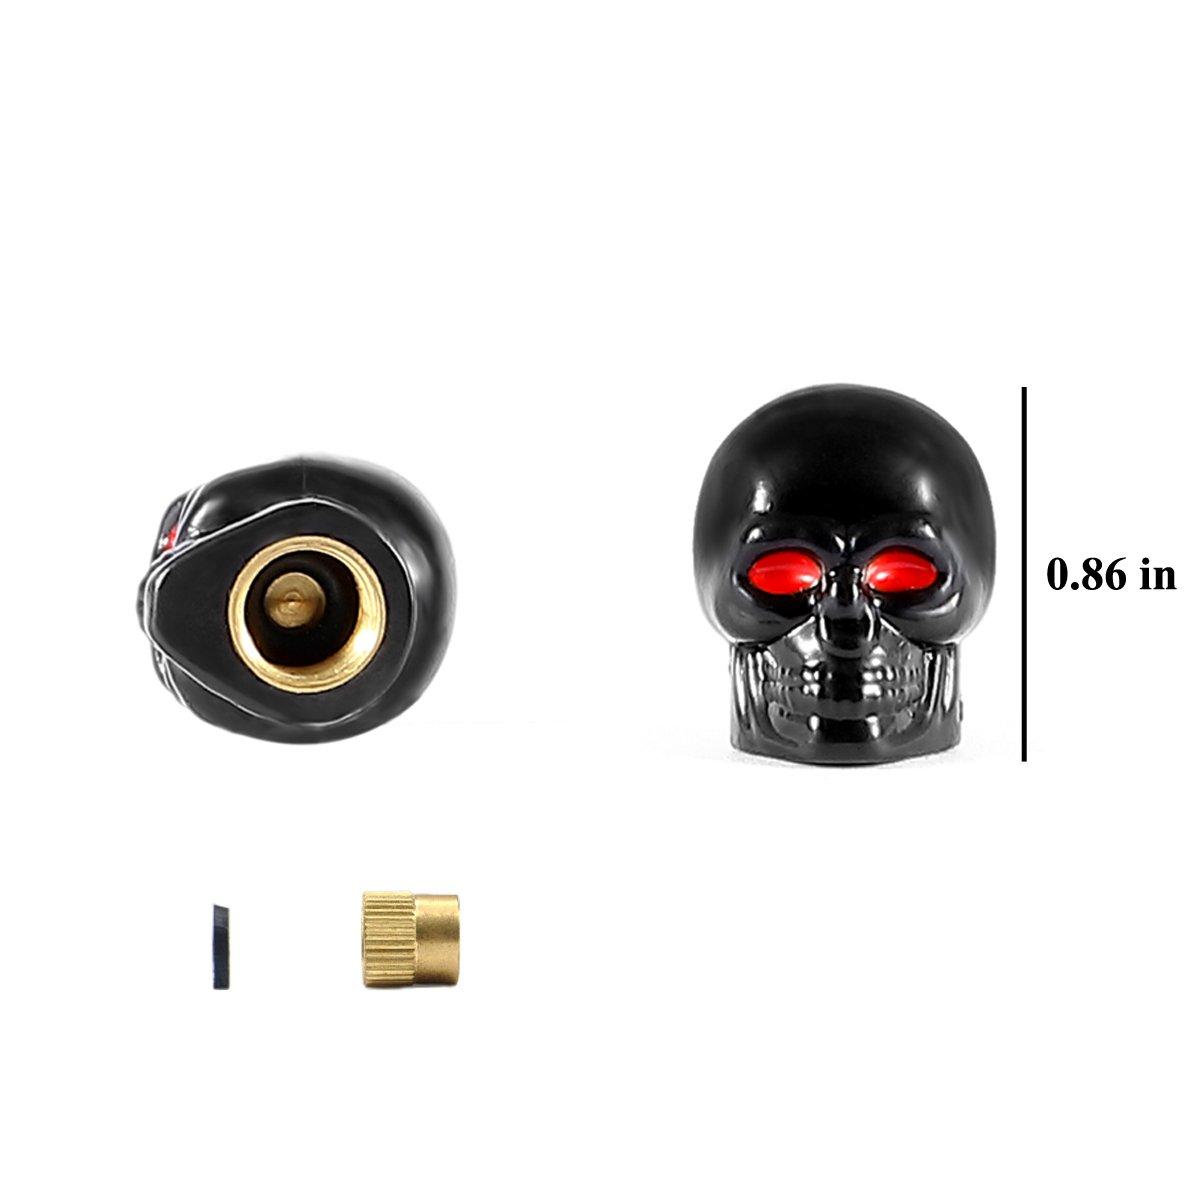 dsycar estilo de calavera para bicicleta motocicleta rueda de coche de válvula de neumáticos Caps madre para coche estilo decoración accesorios - 4 ...